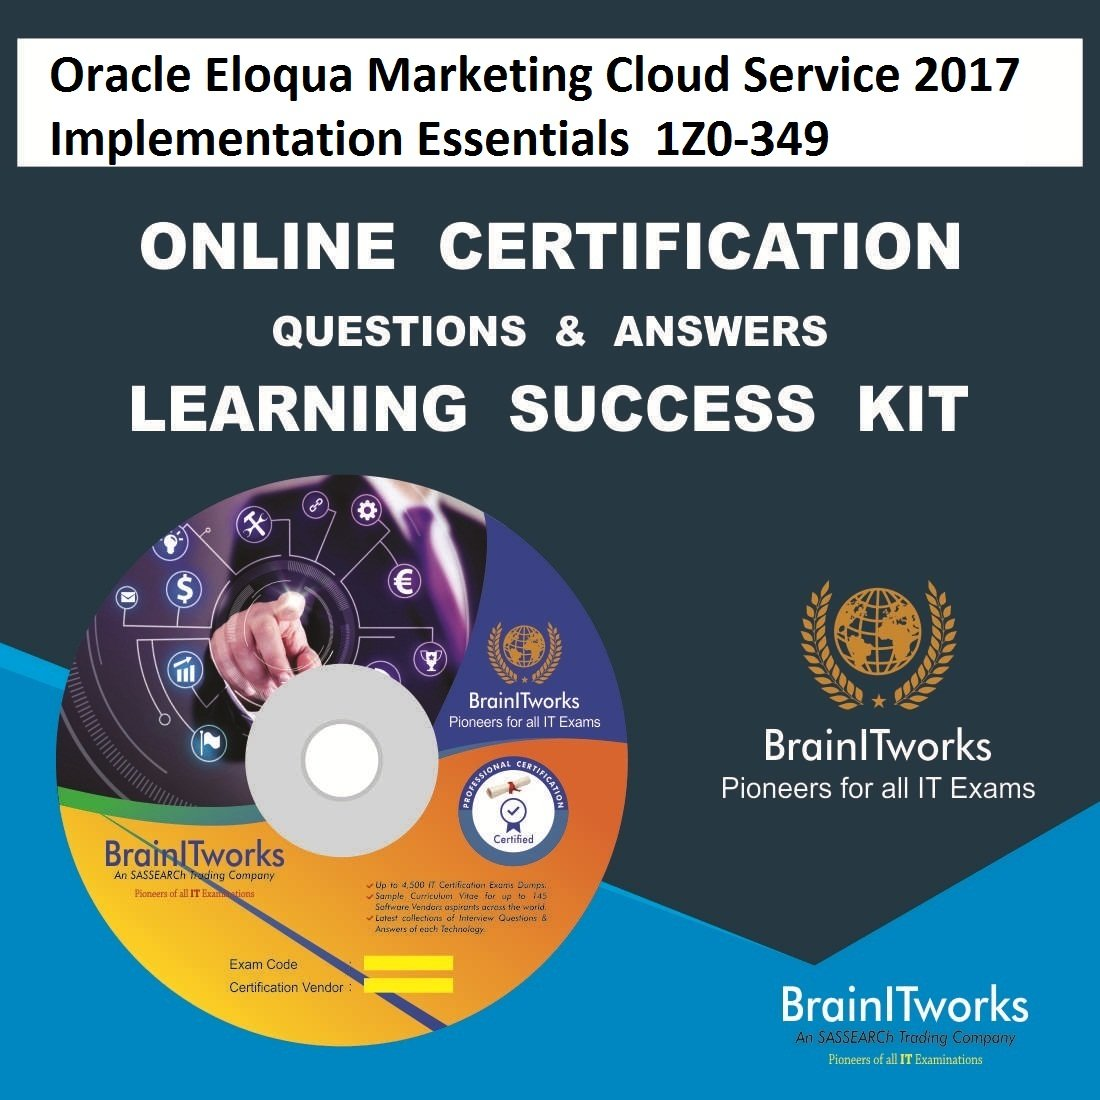 Oracle Eloqua Marketing Cloud Service 2017 Implementation Essentials